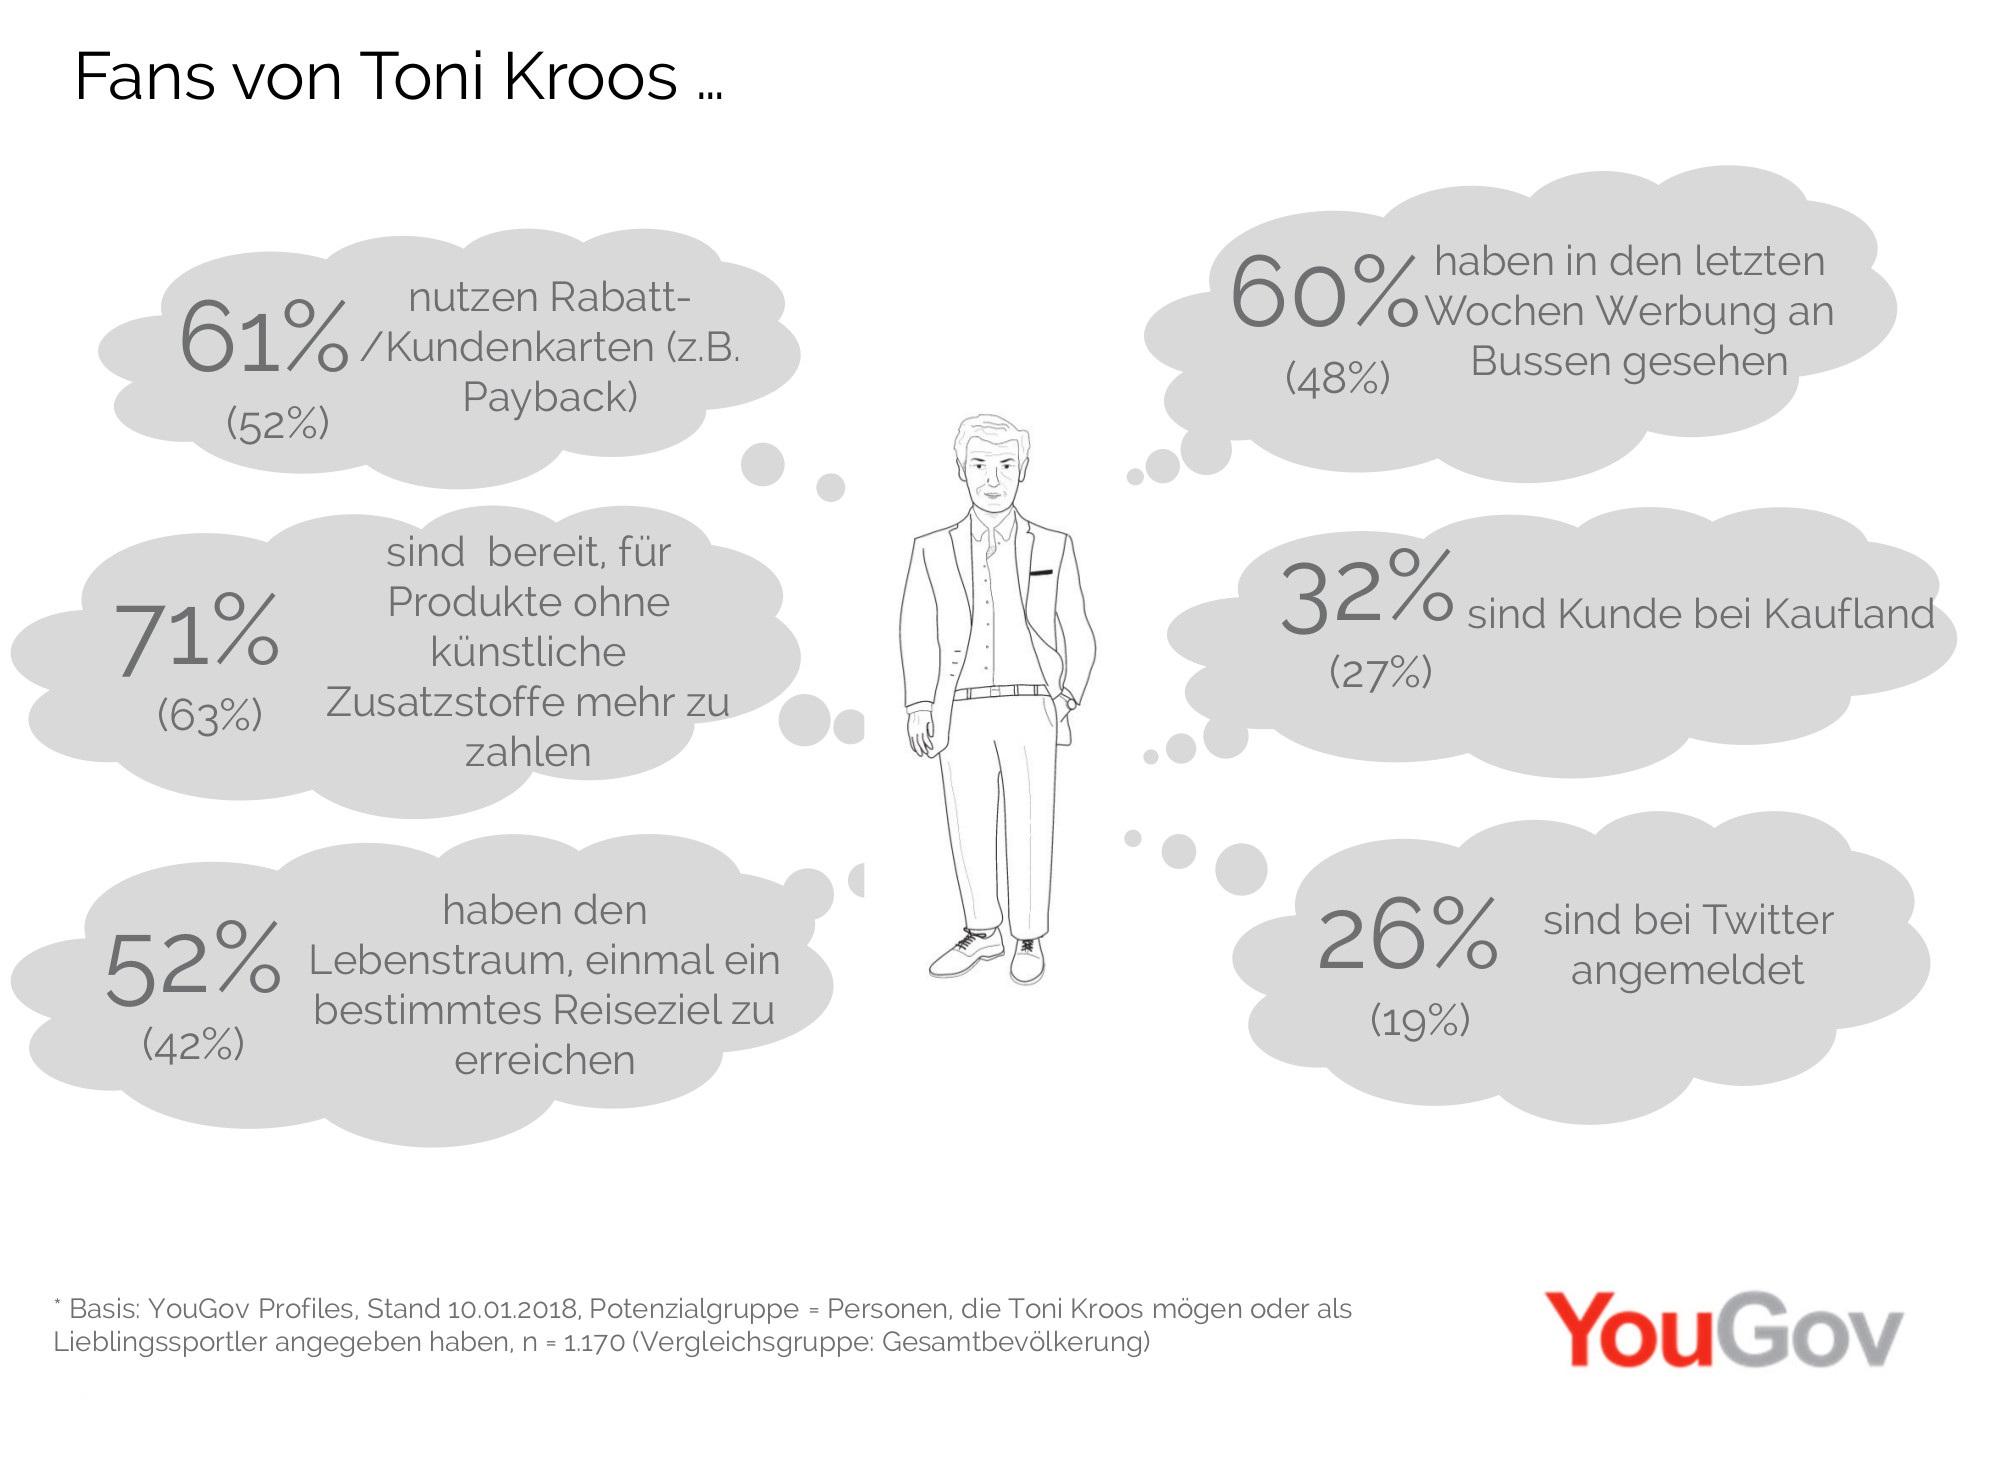 Fans von Toni Kroos